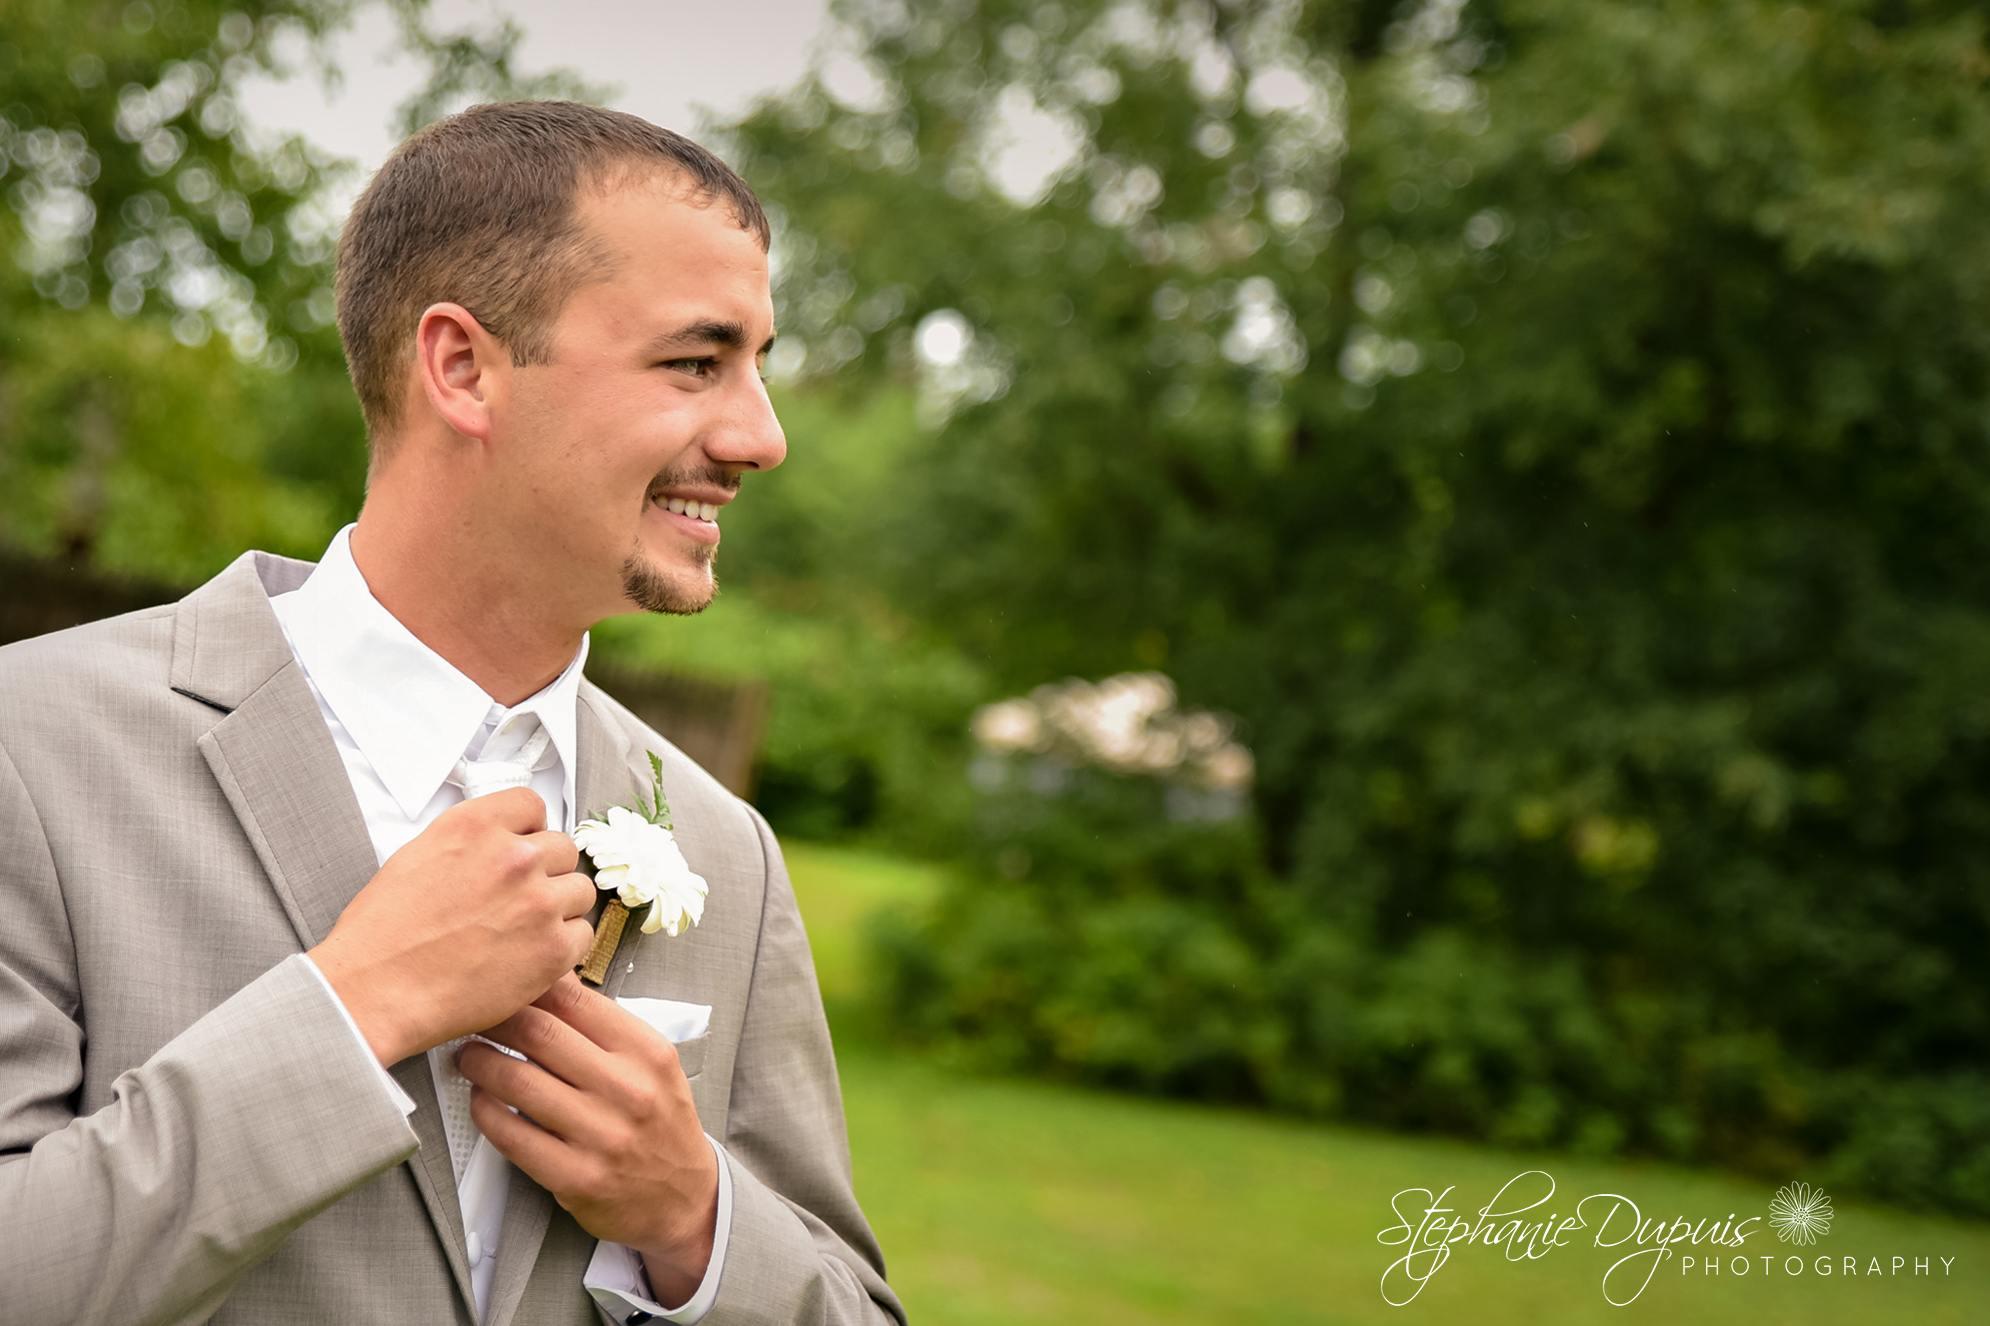 Lancaster Wedding Photographer 02 4 - Portfolio: Nason Wedding